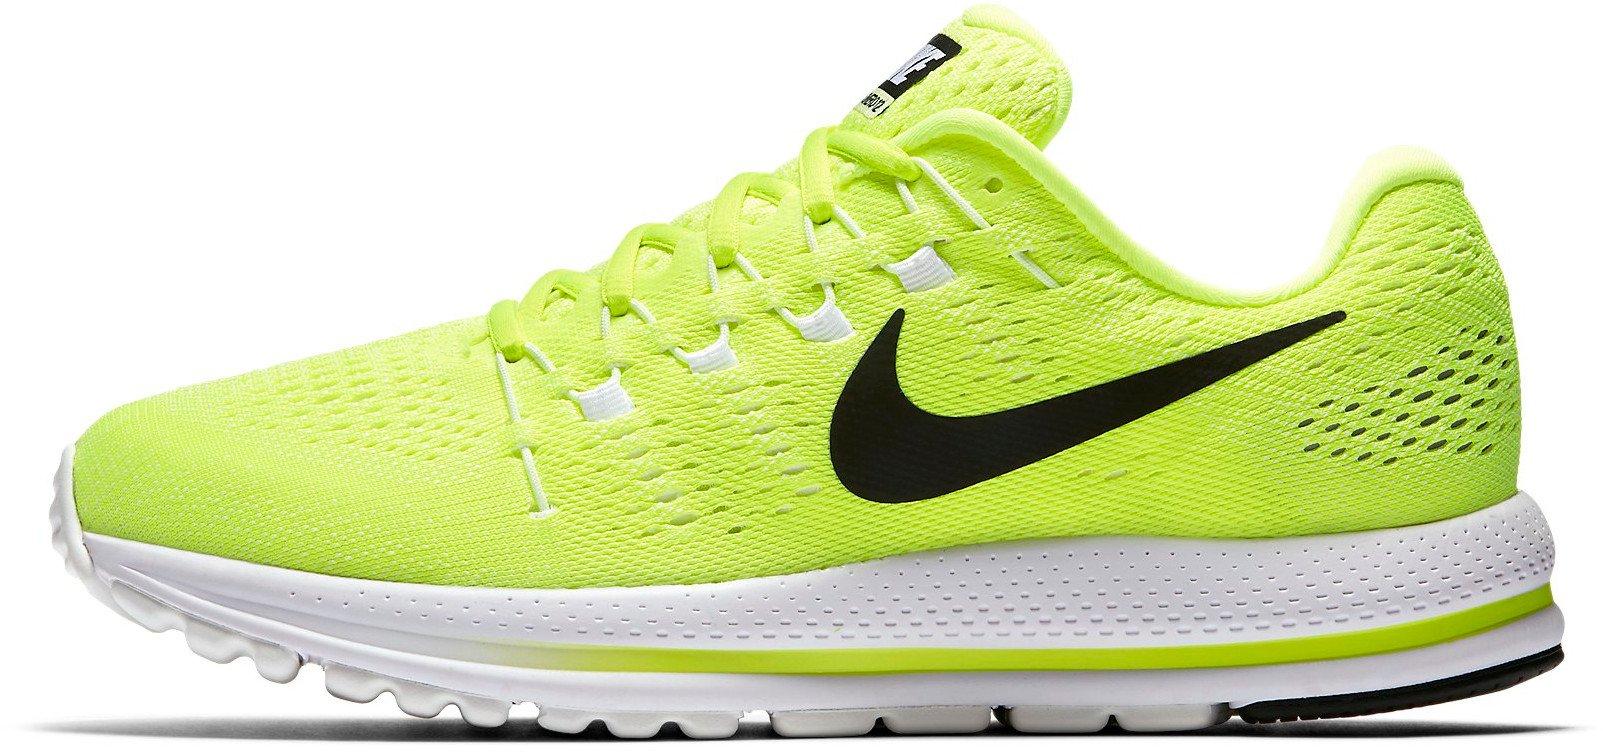 Arqueólogo Misión Diariamente  Running shoes Nike AIR ZOOM VOMERO 12 - Top4Running.com